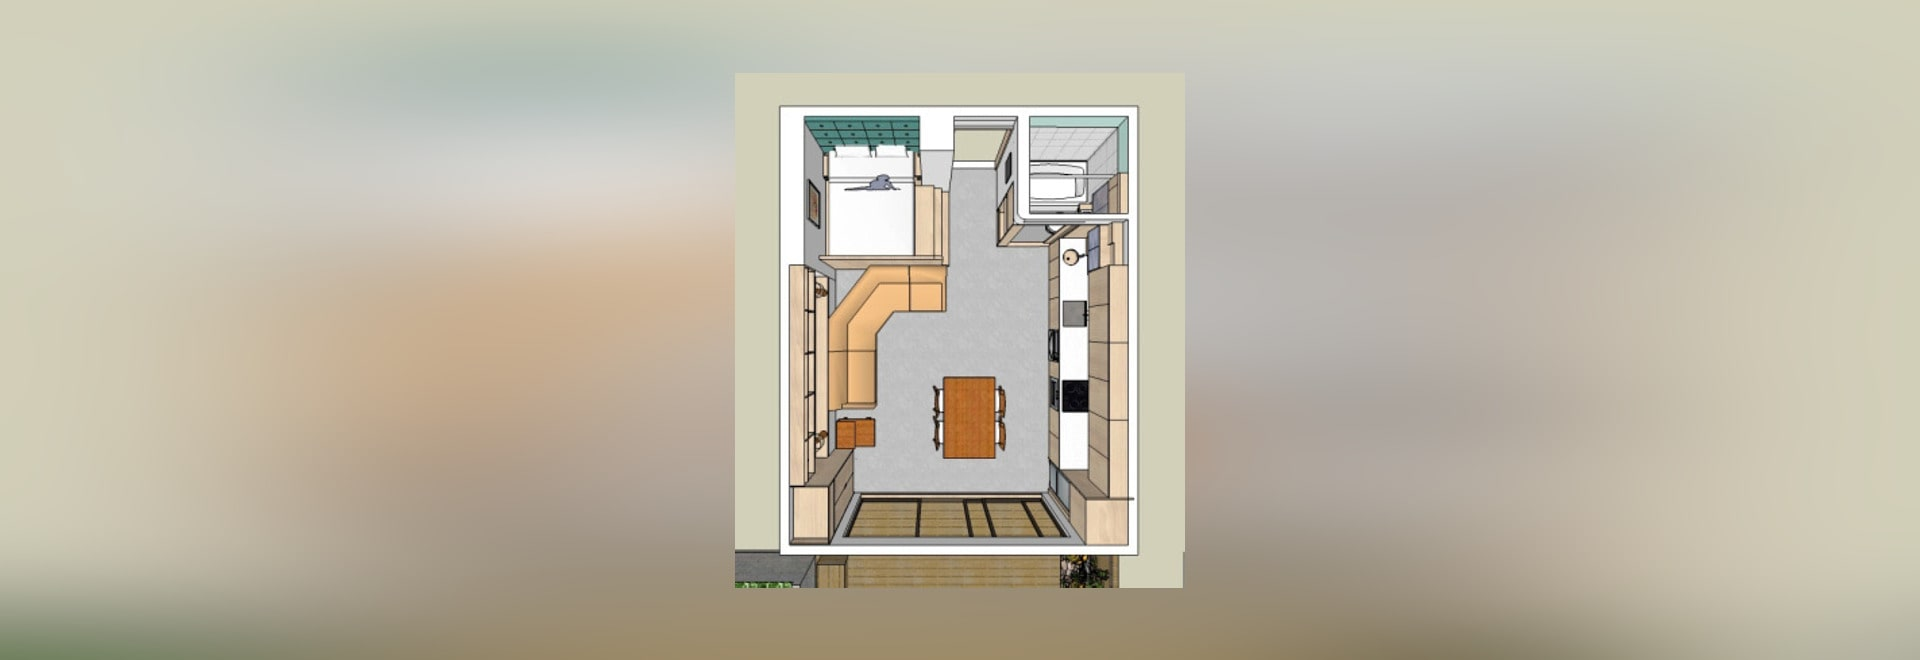 designer bryn davidson transforms a tiny vancouver apartment into an